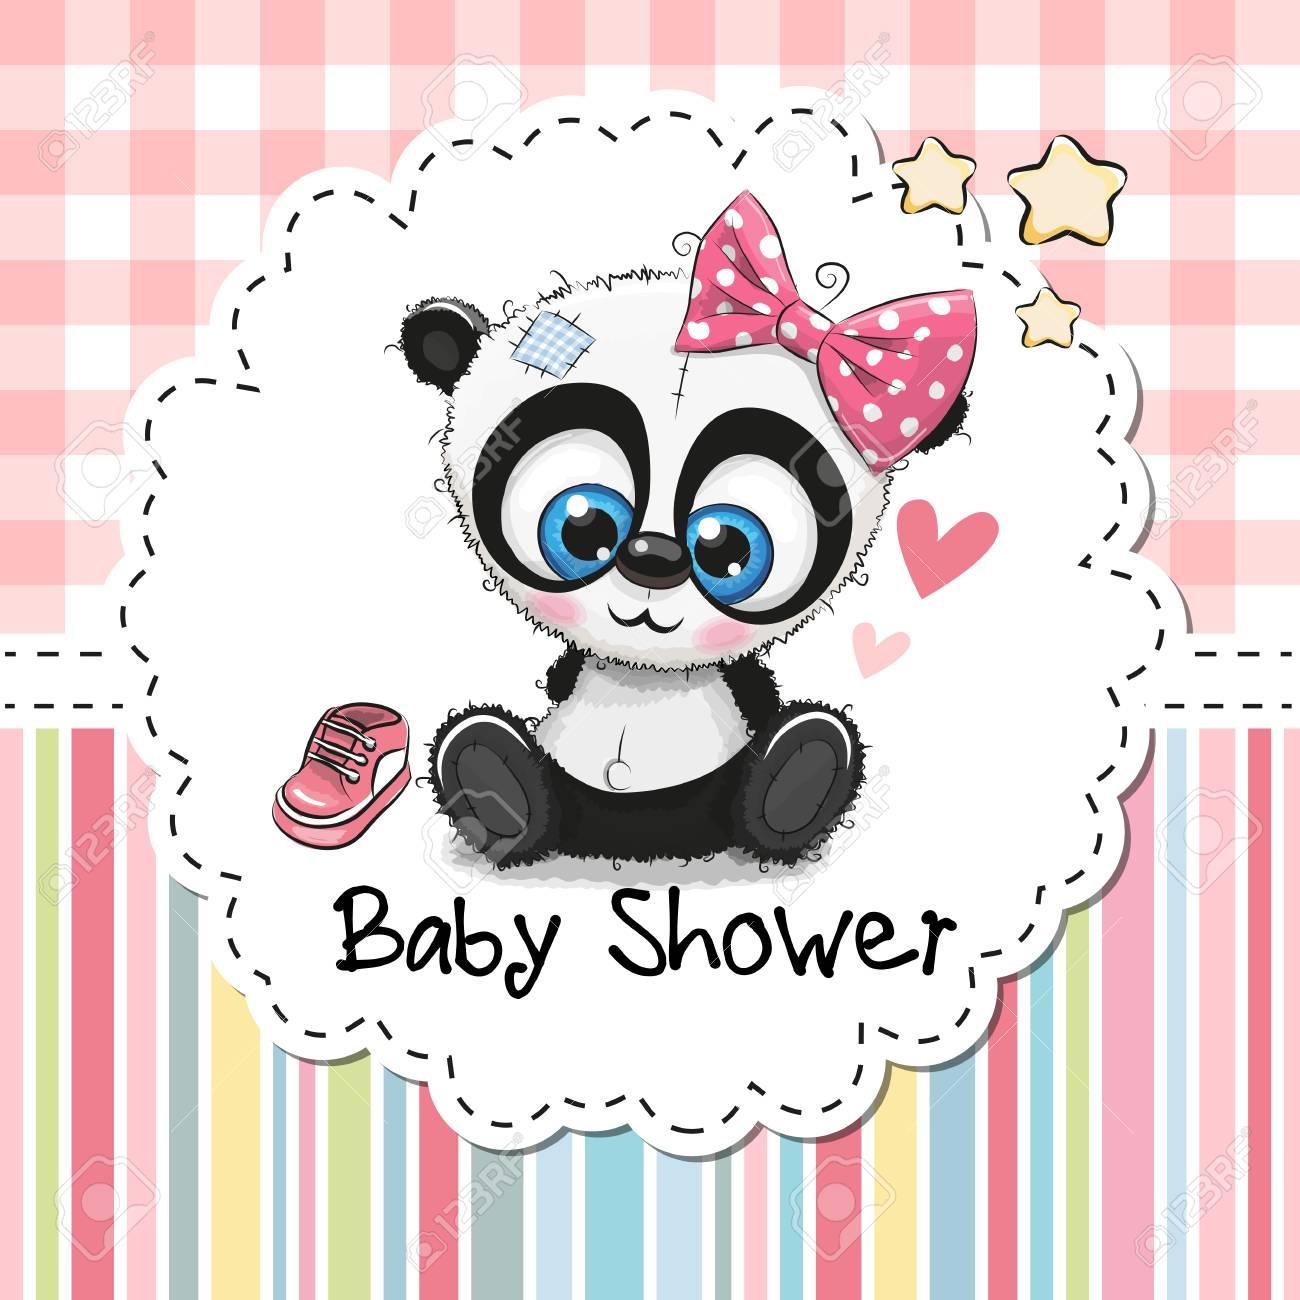 Baby Shower Greeting Card With Cute Cartoon Panda Girl Clip Art